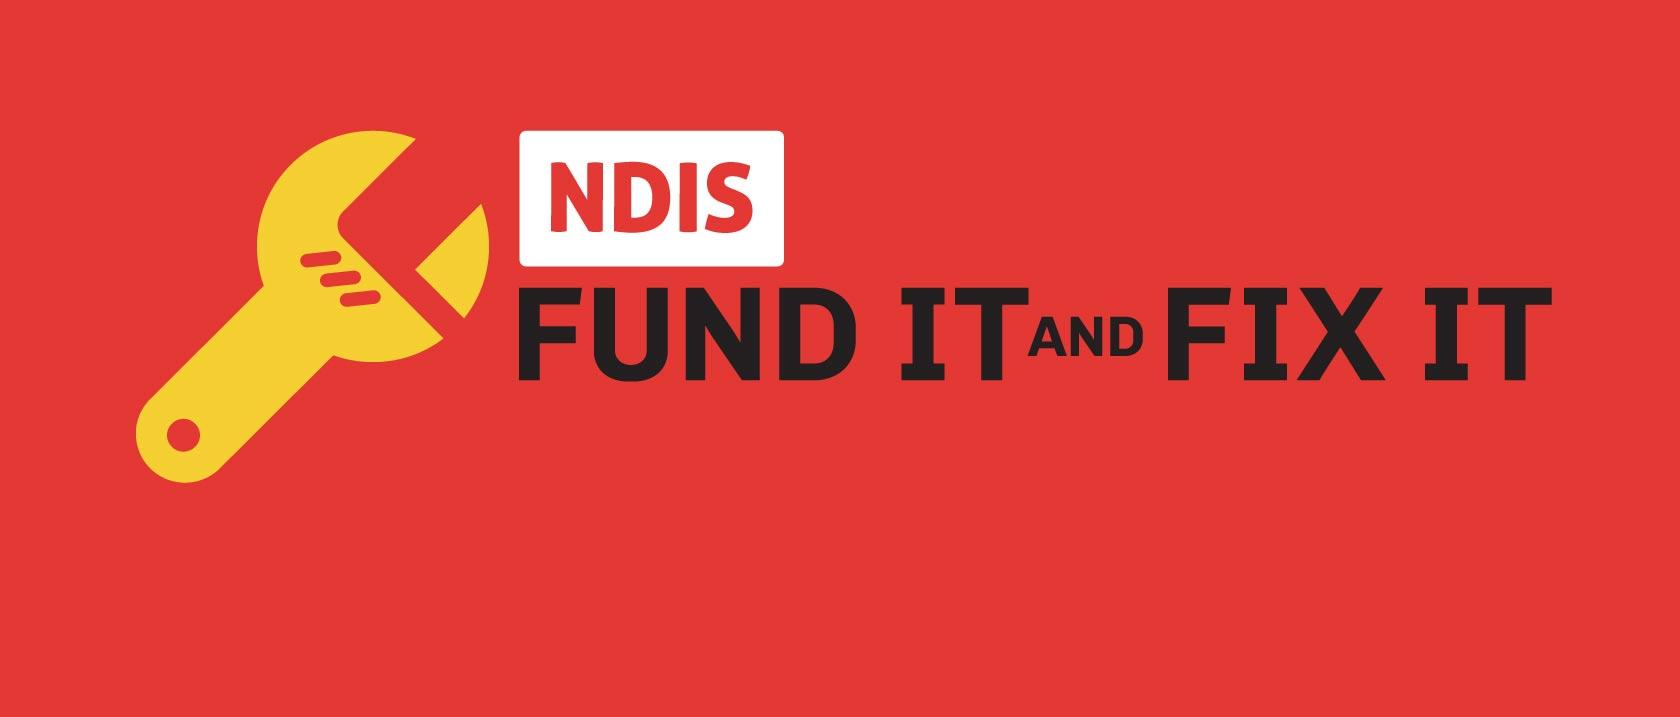 NDIS Fund it and Fix it